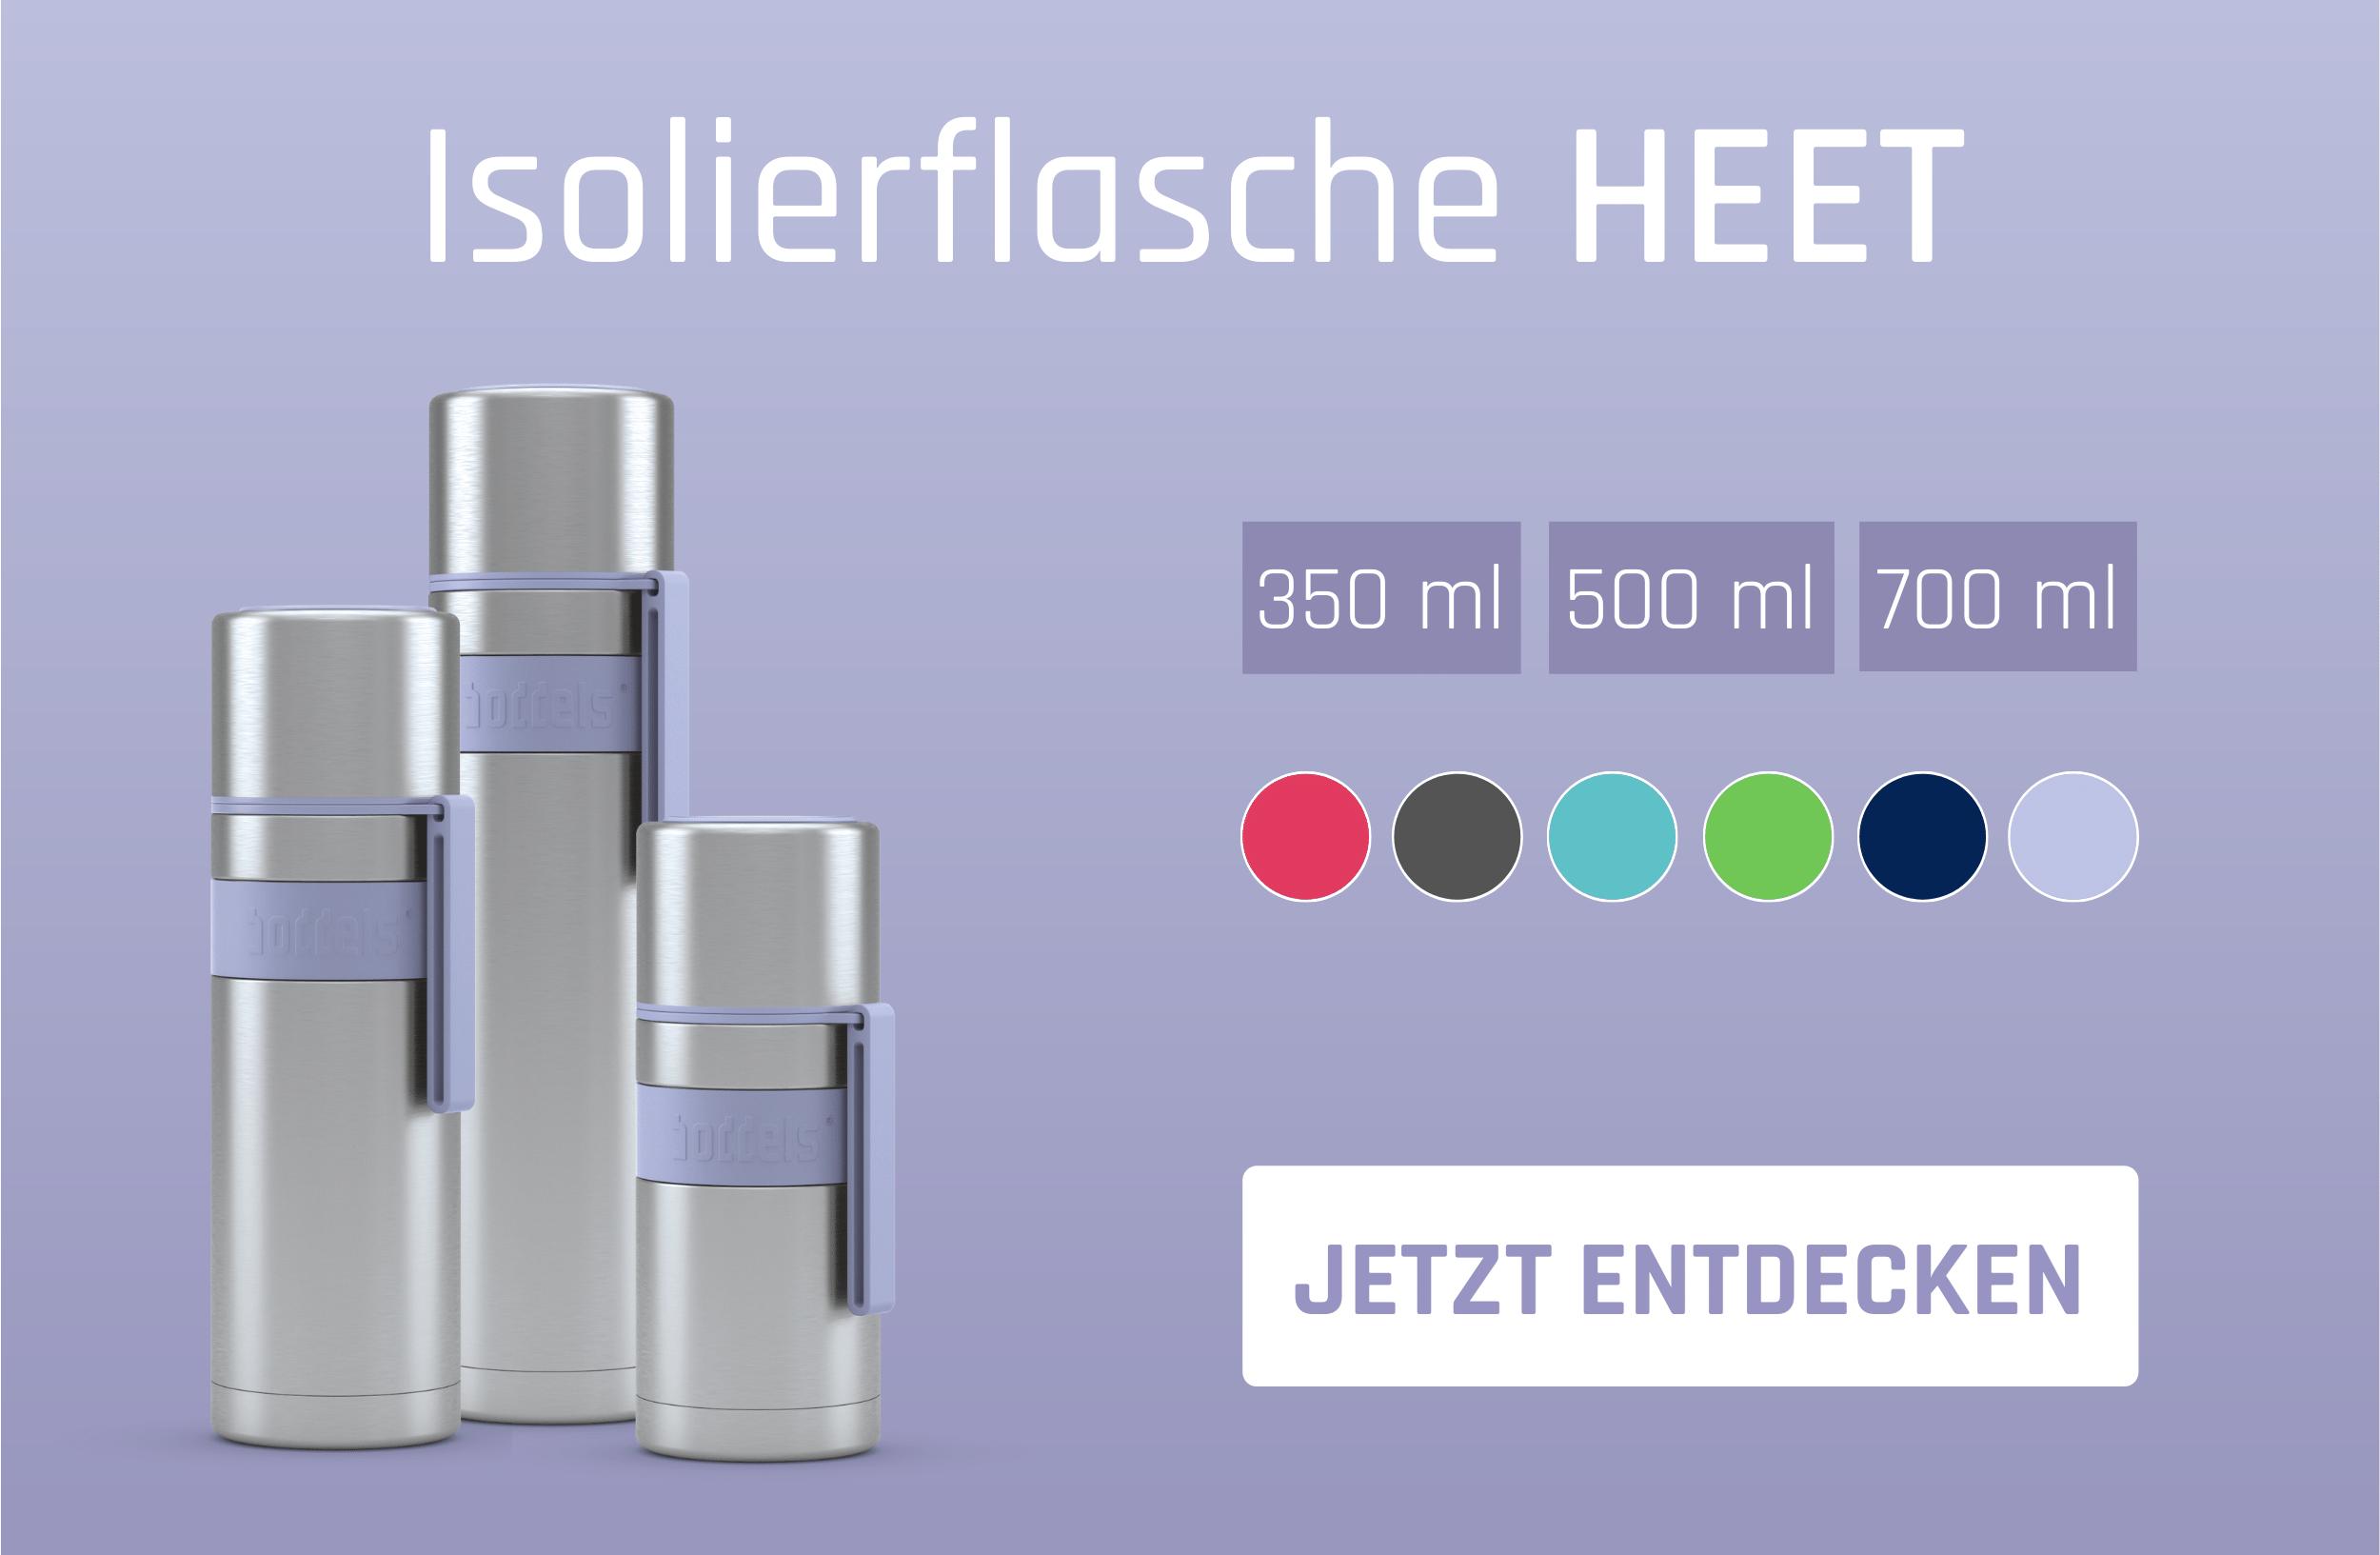 Isolierflasche HEET